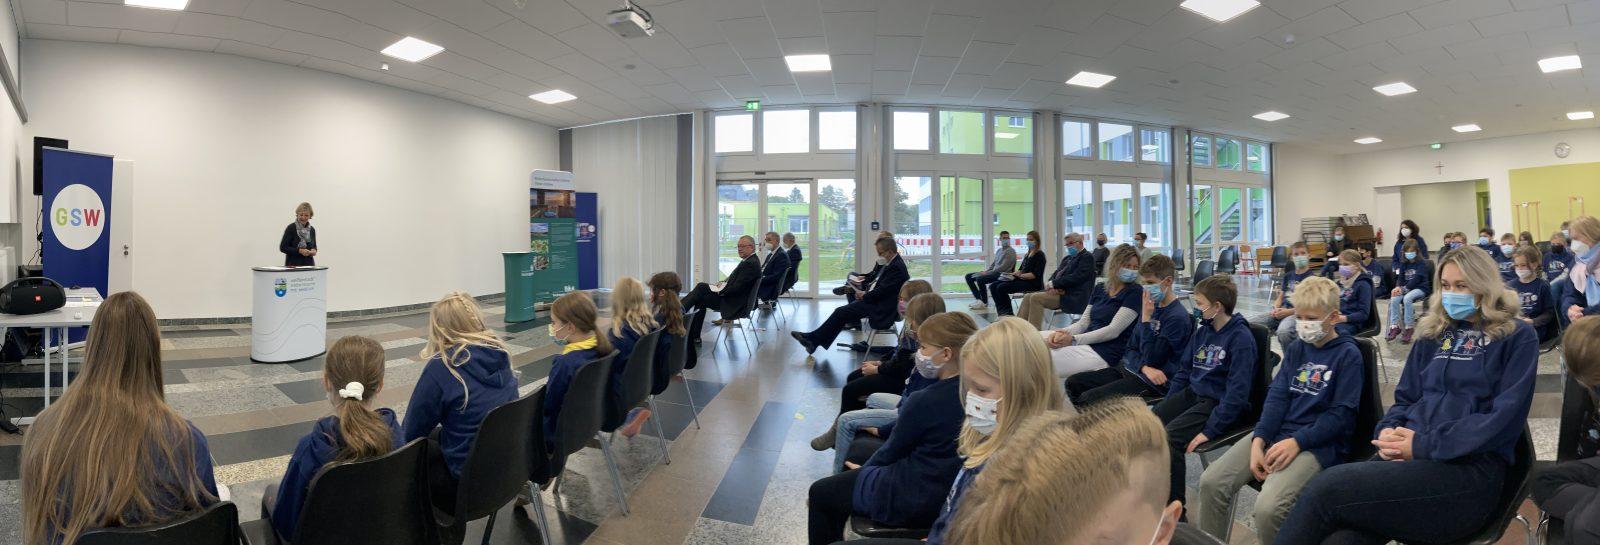 Zertifizierung Naturpark-Schule Grundschule Weißenstadt